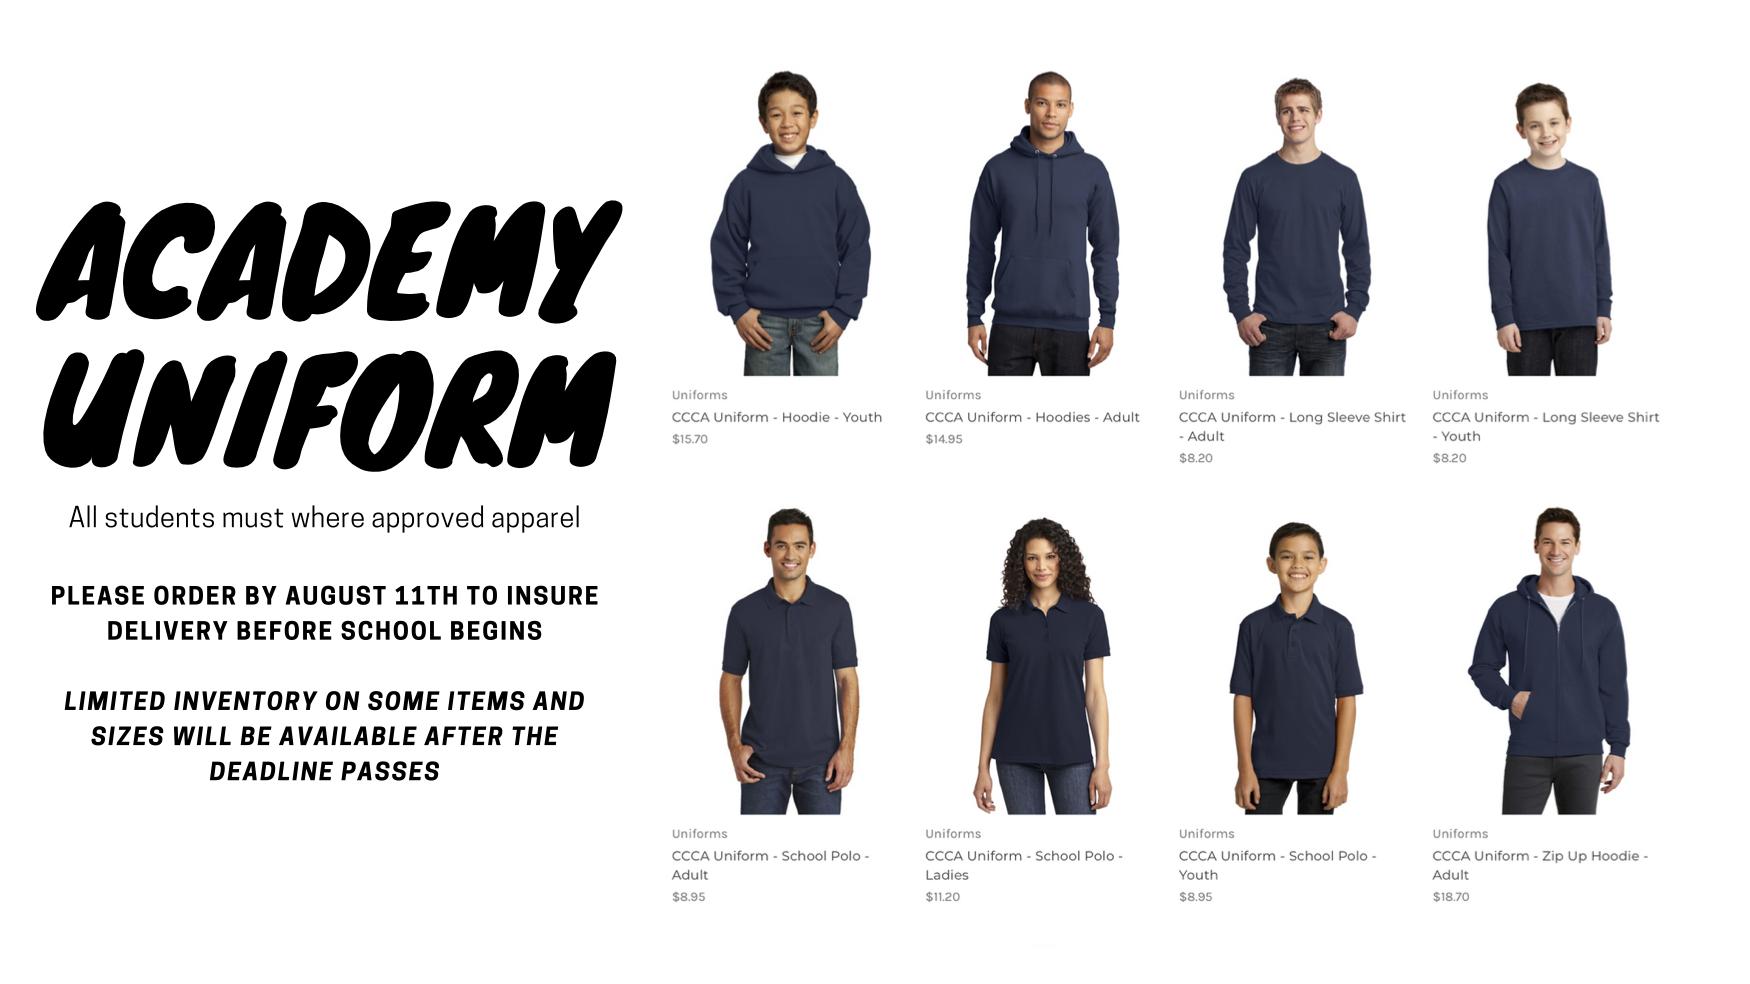 academy-uniform-2.png